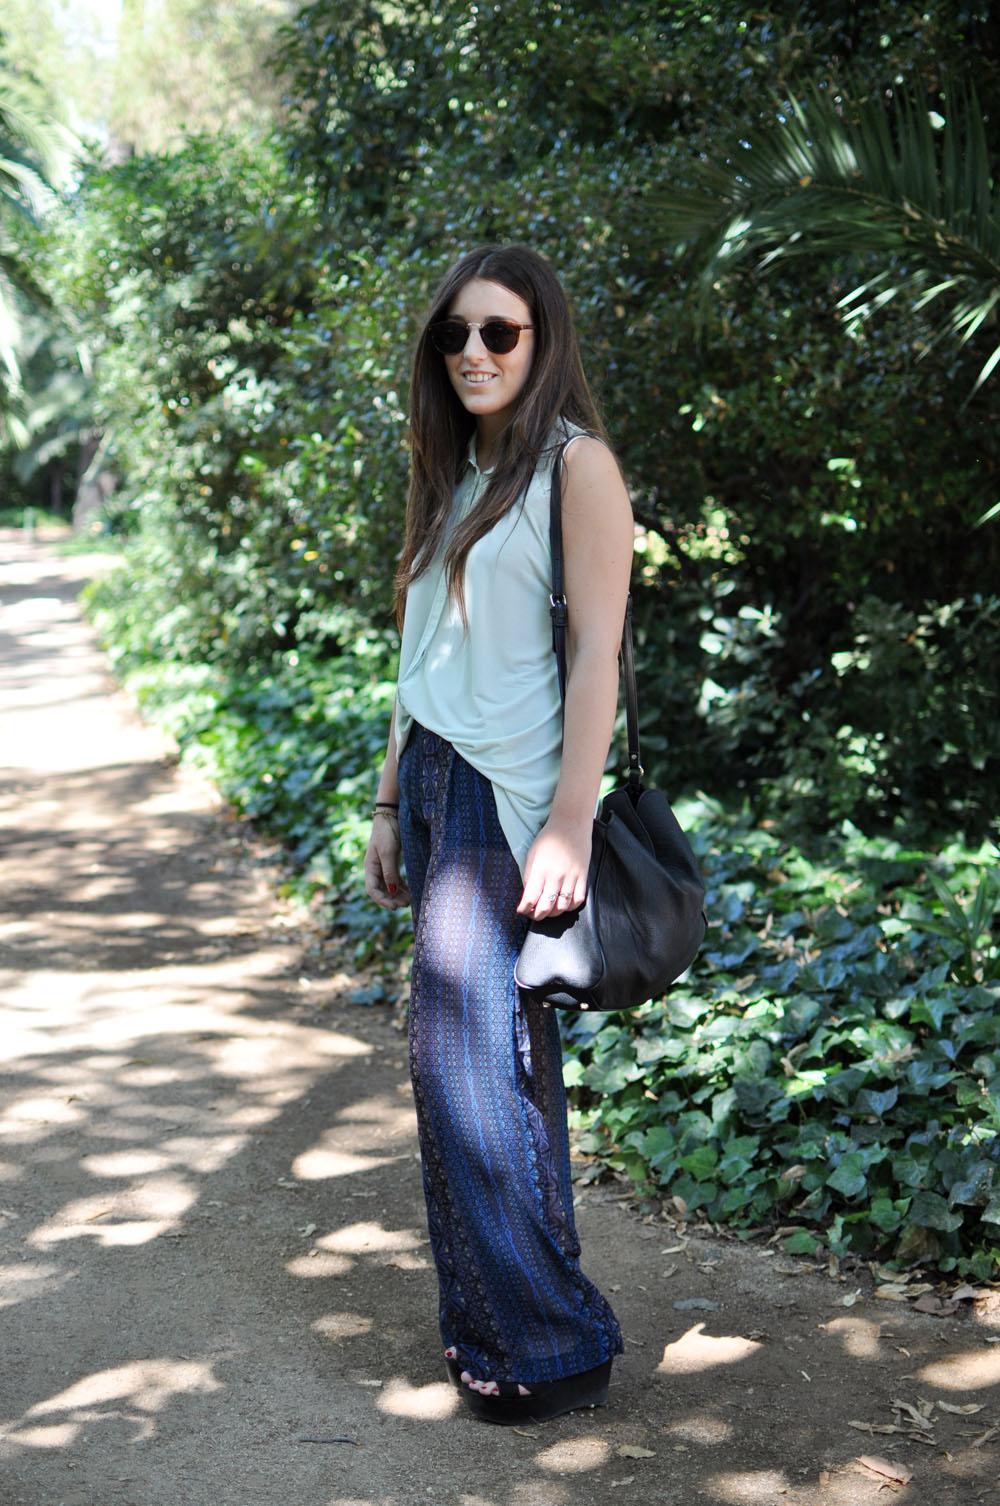 Mireia at 080 barcelona fashion